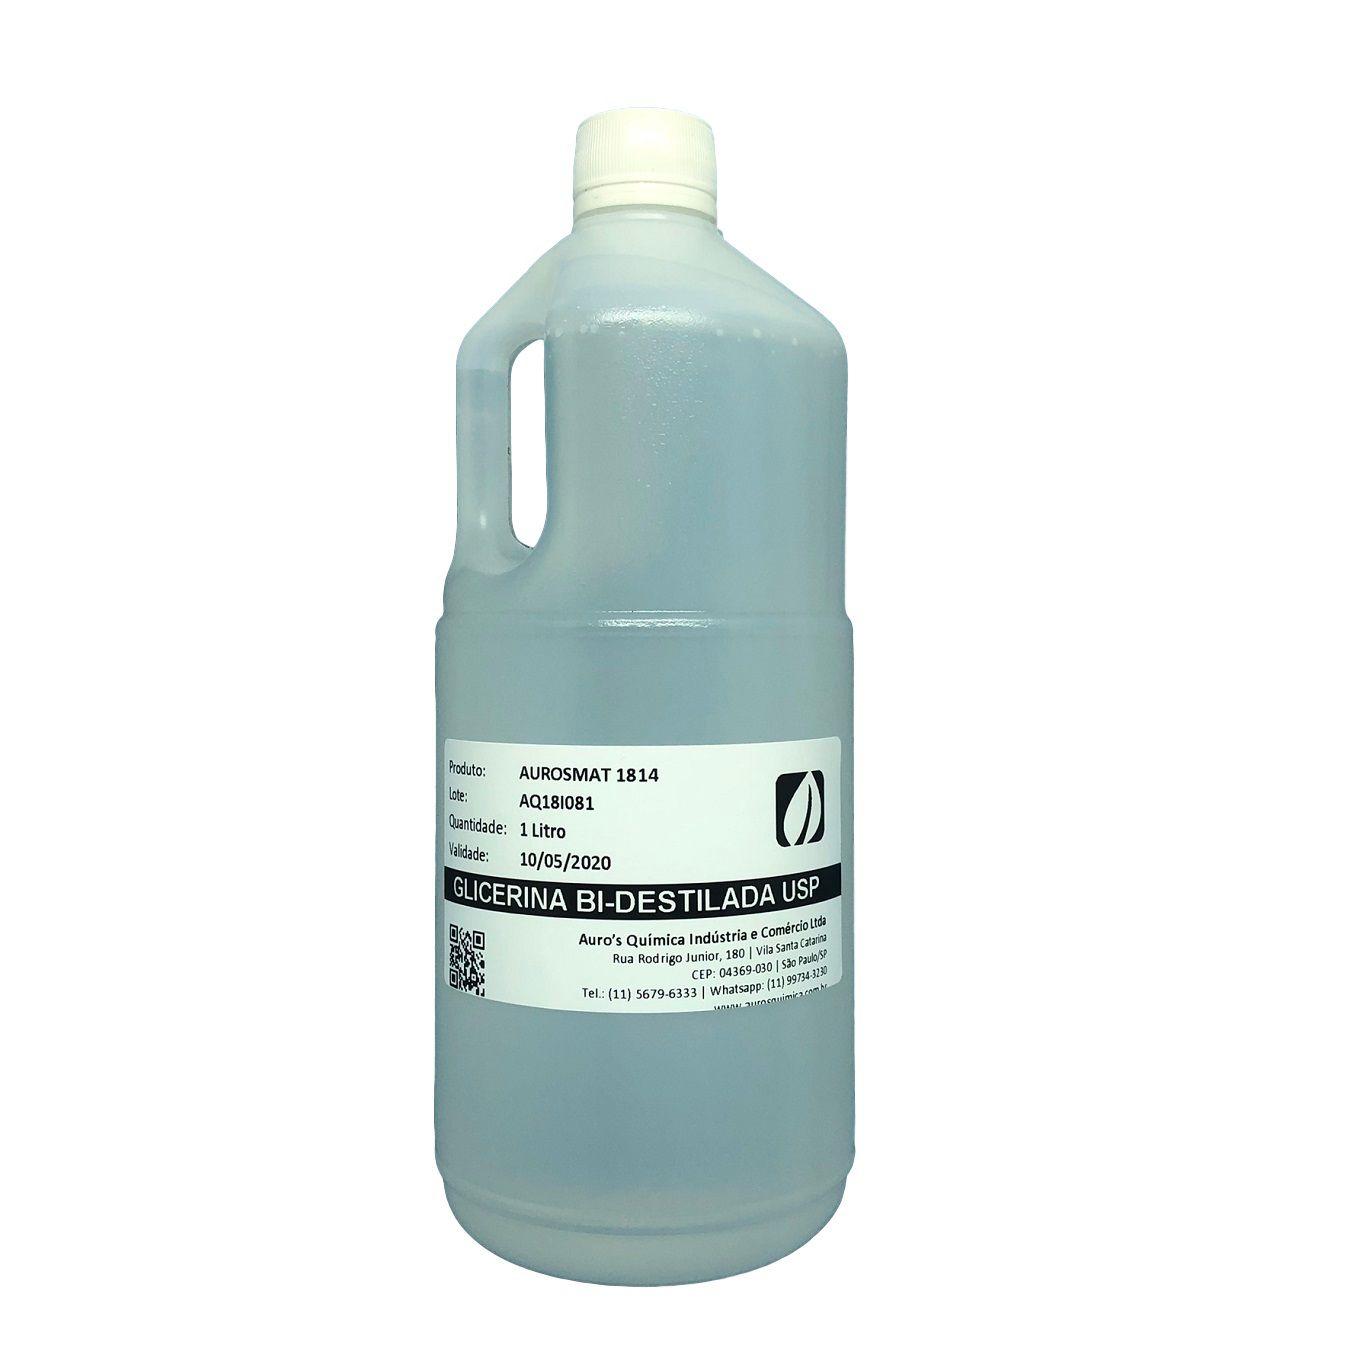 Kit E-Liquid (Glicerina USP + Propilenoglicol USP)